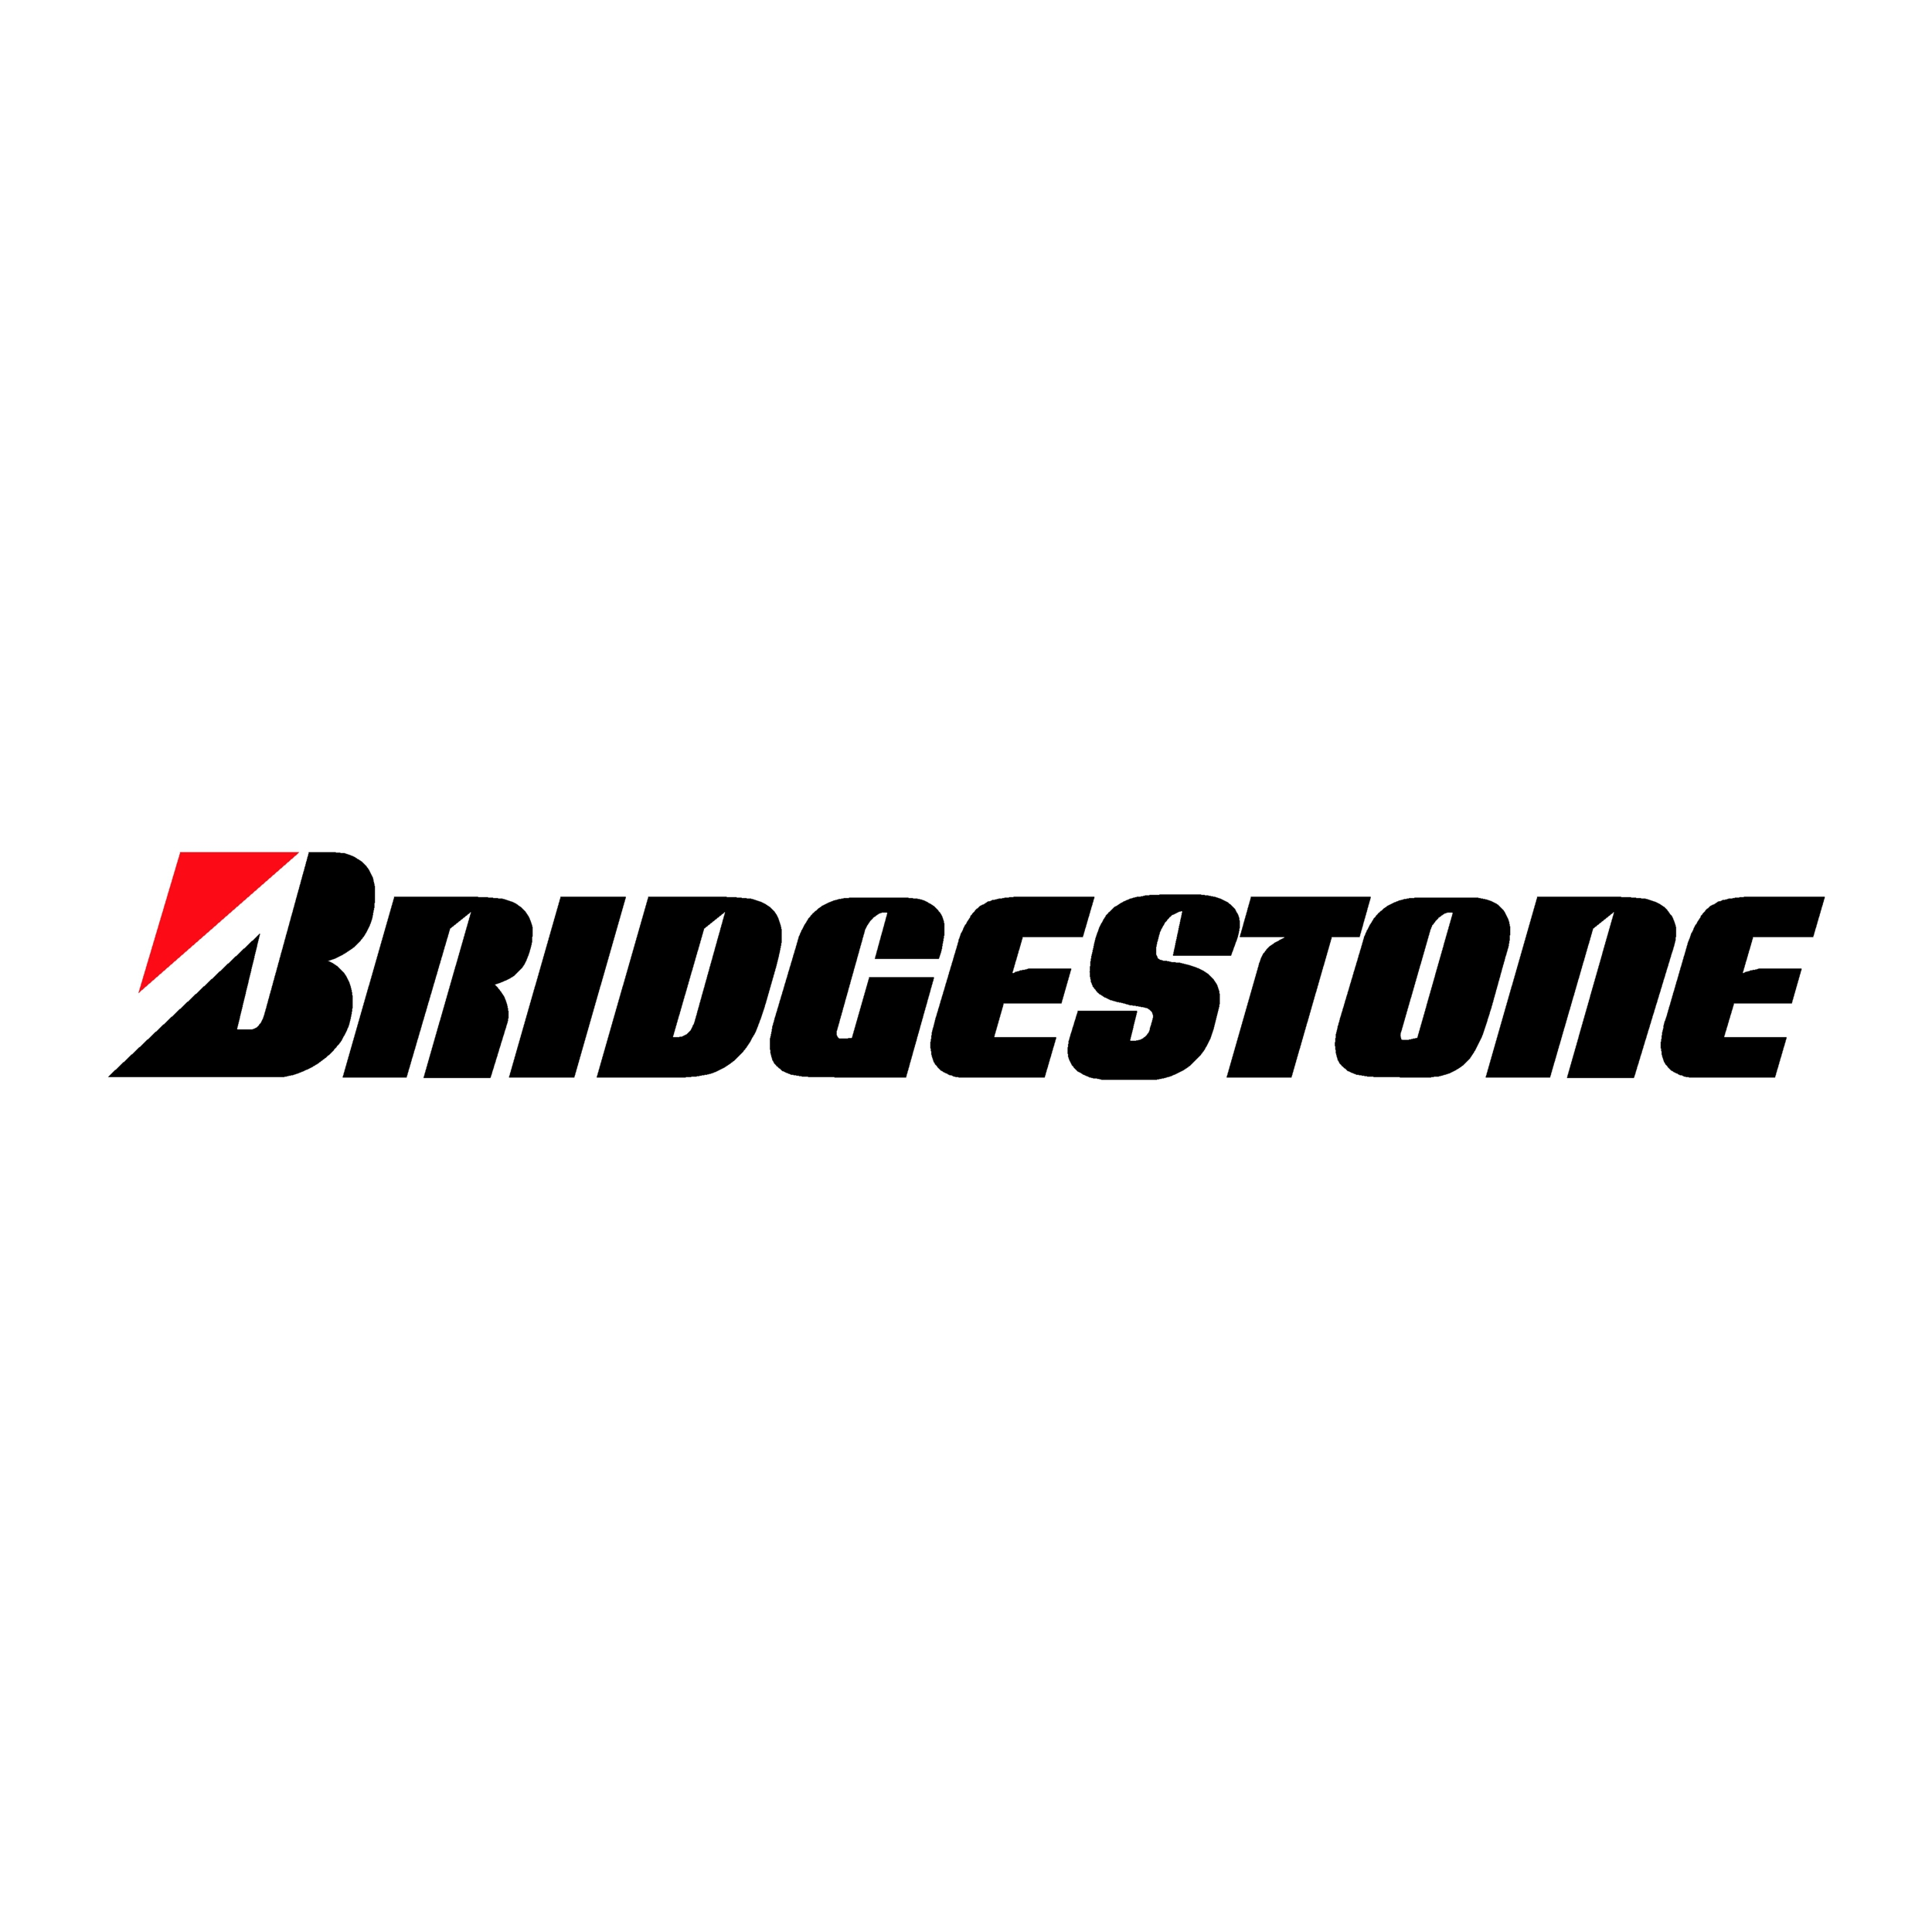 stickers bridgestone ref 2 tuning audio sonorisation car auto moto camion competition deco rallye autocollant